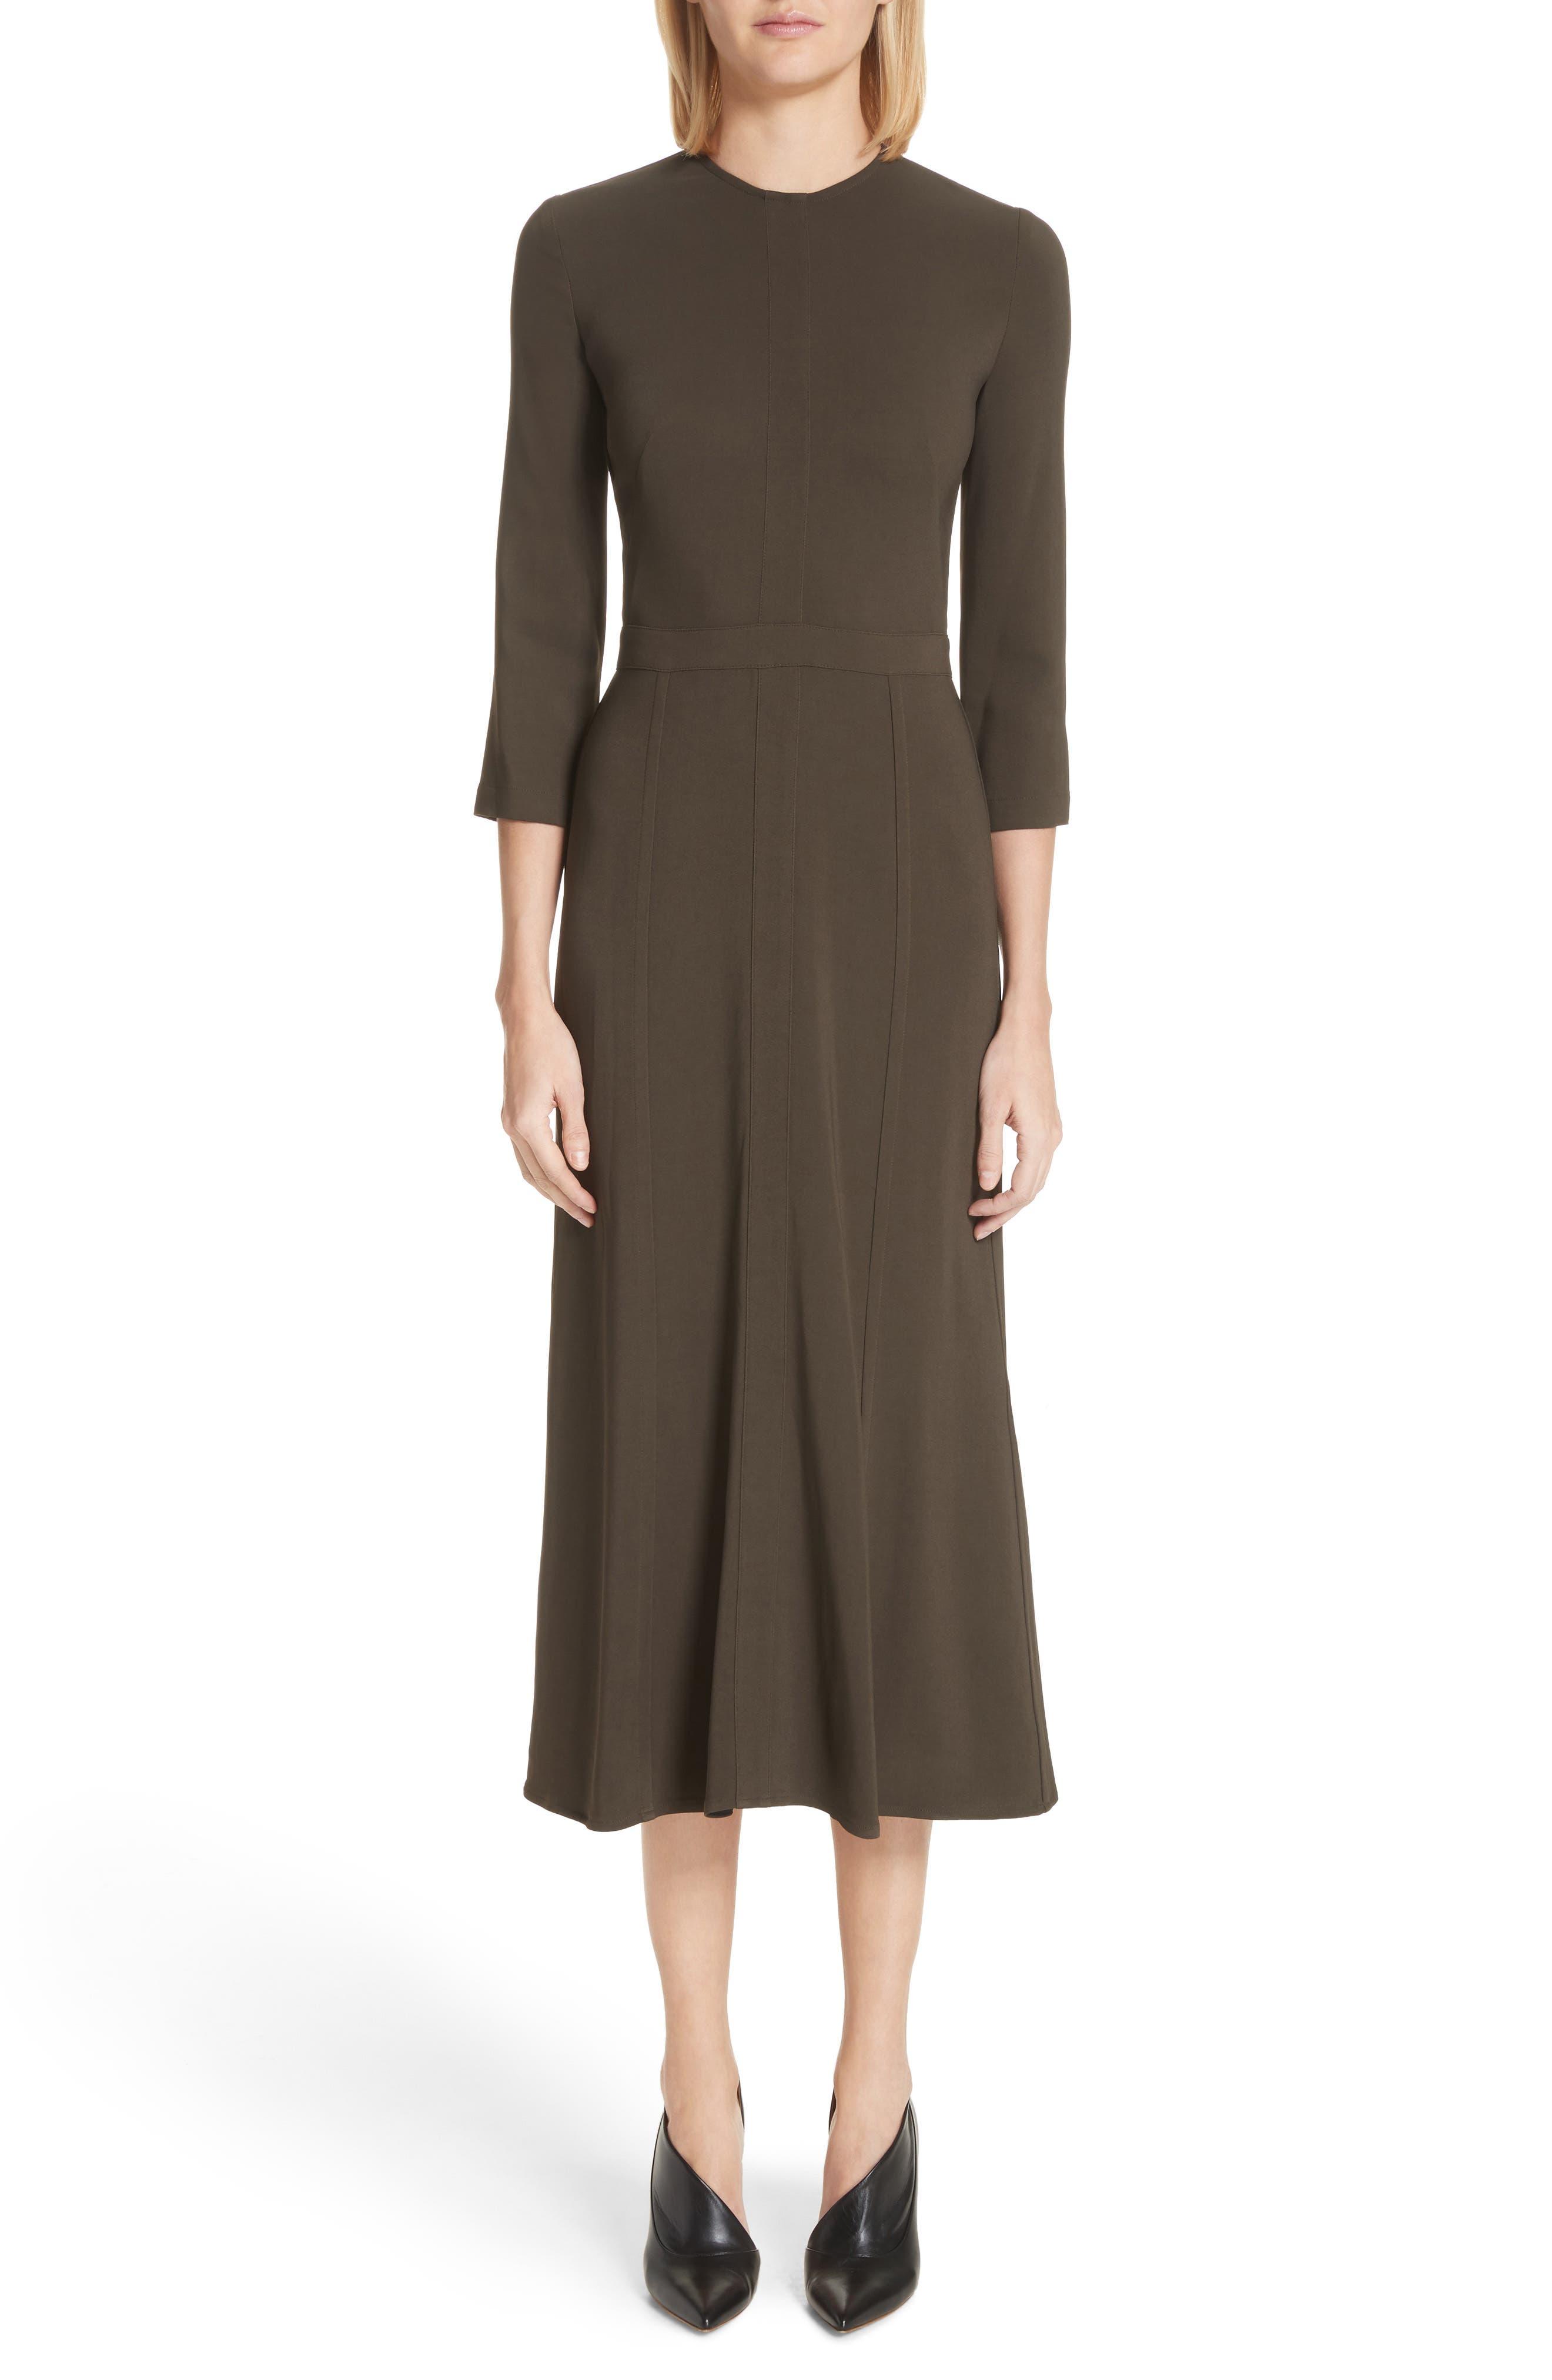 Alternate Image 1 Selected - Victoria Beckham Paneled Cady Midi Dress